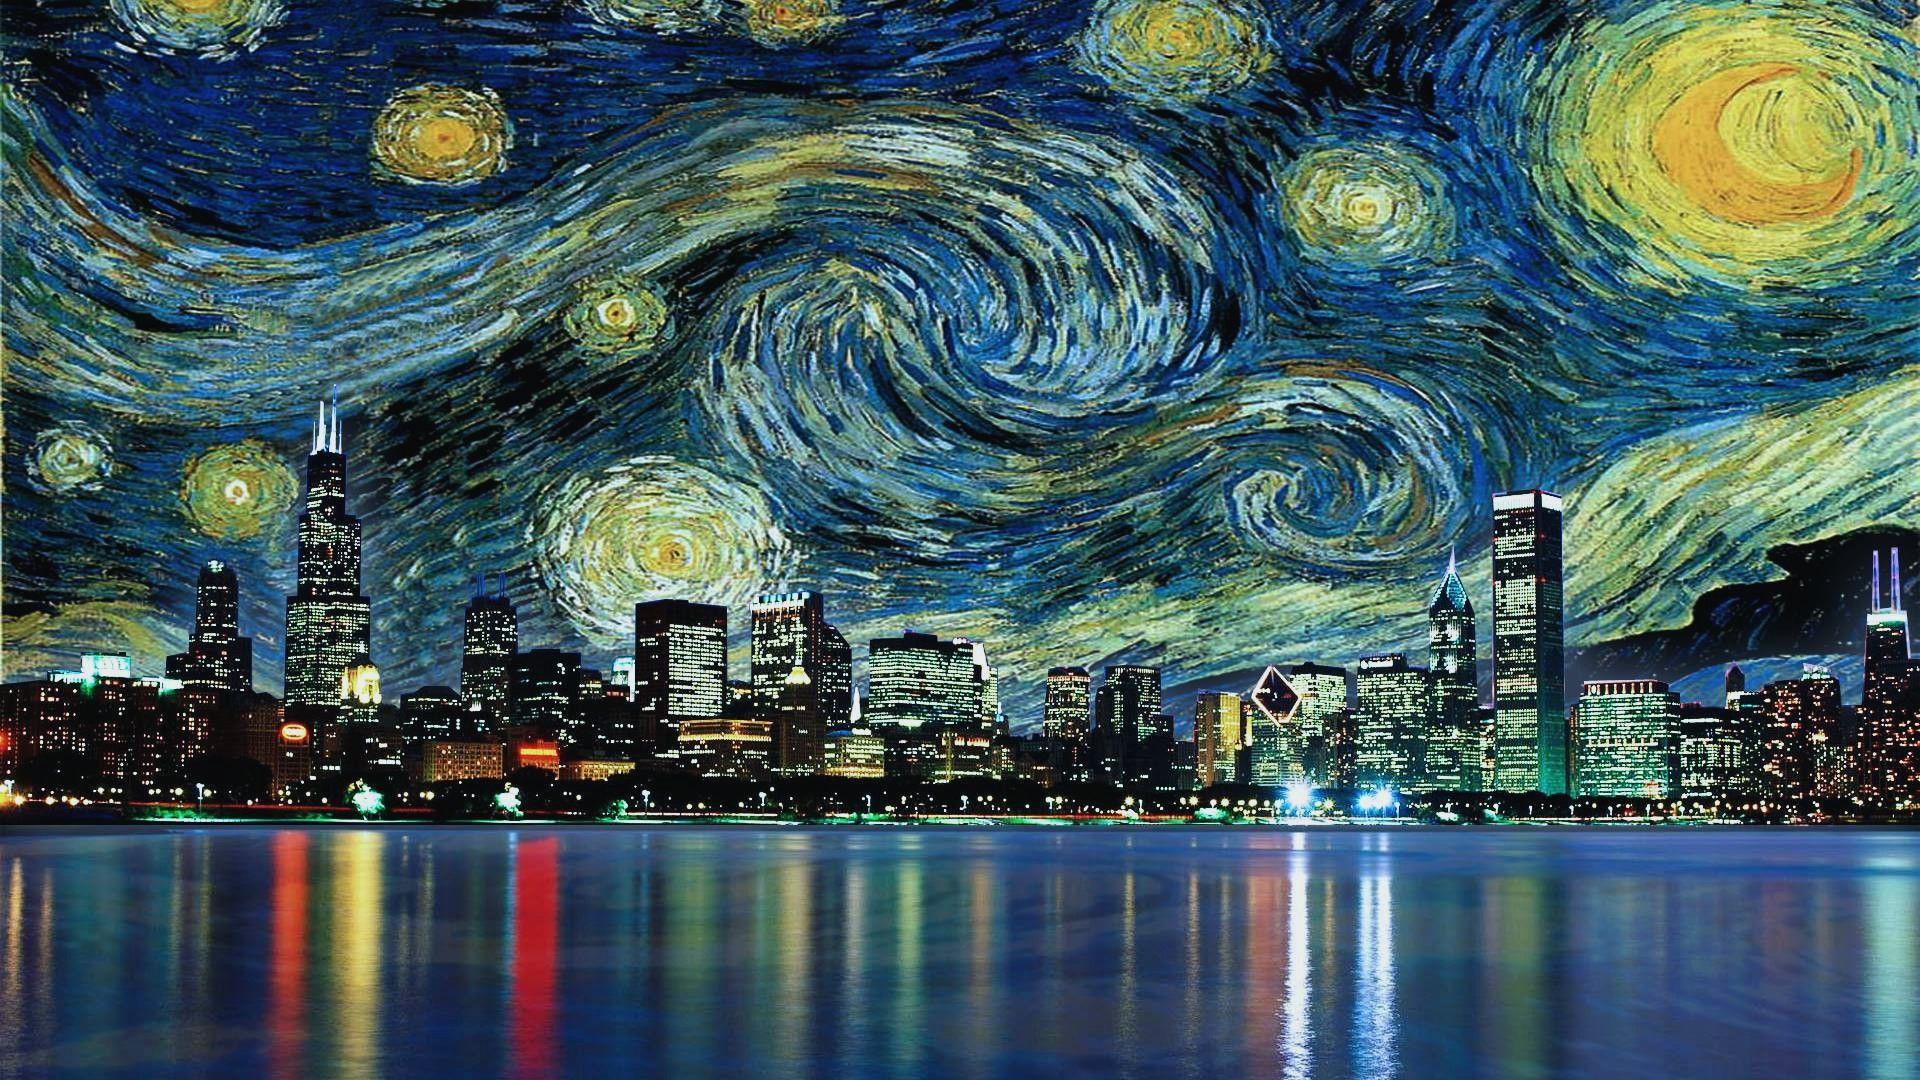 2 Chicago Jpg 1920 1080 Starry Night Van Gogh Starry Night Wallpaper Gogh The Starry Night